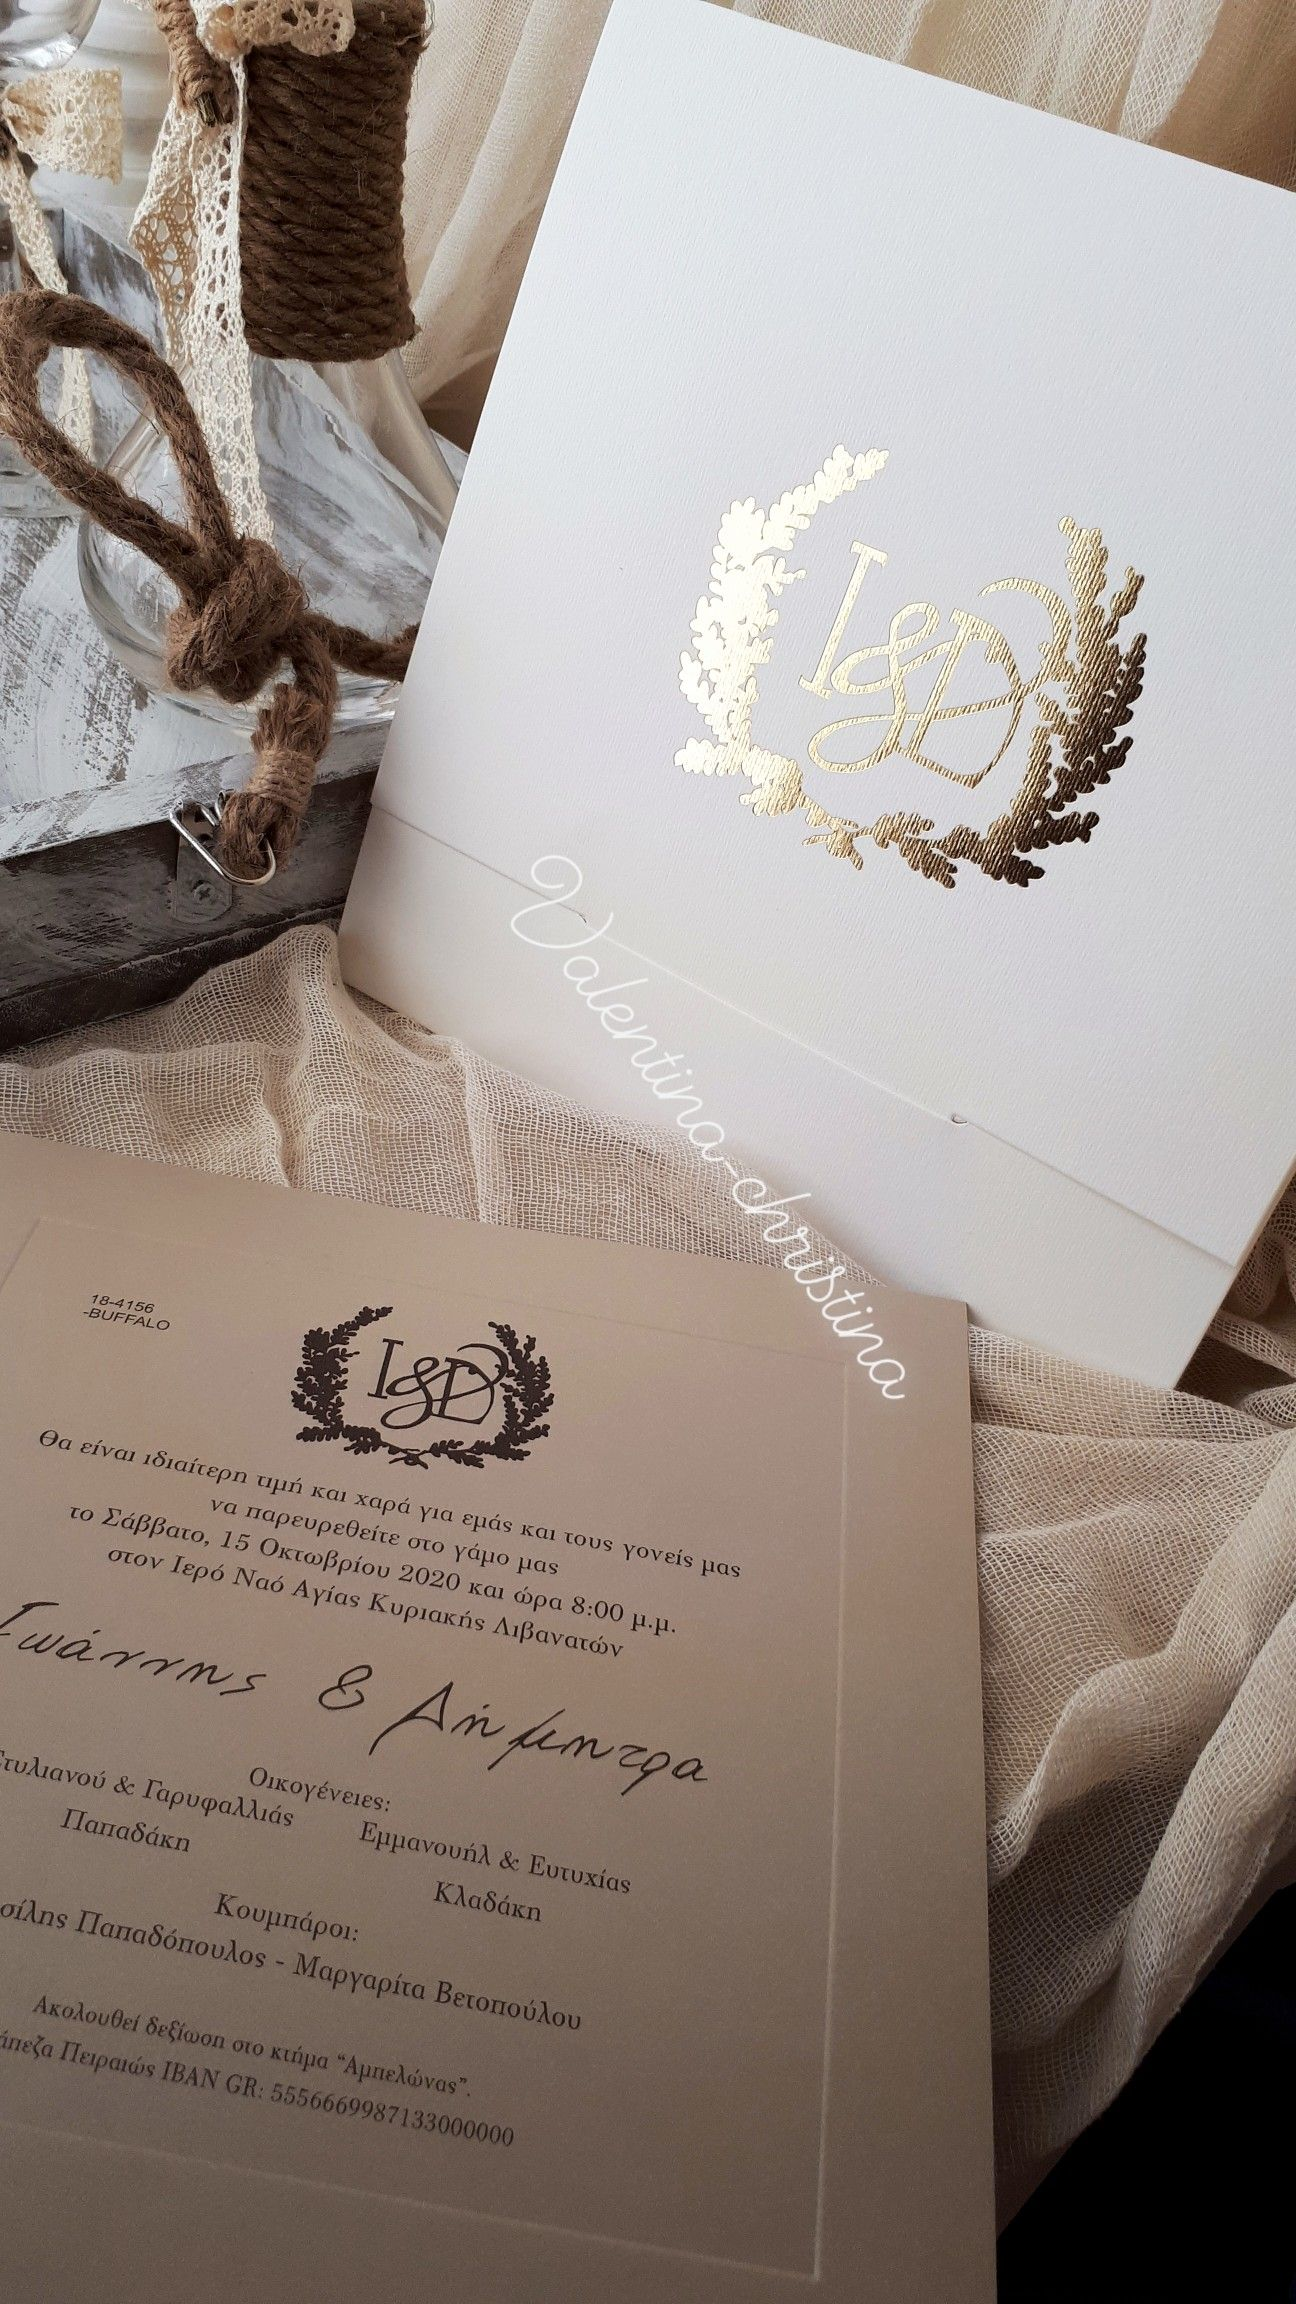 518e2ac9d2d7 Μοναδικά προσκλητήρια γάμου σε κλασικό στυλ αριστοκρατική γραμμή ...